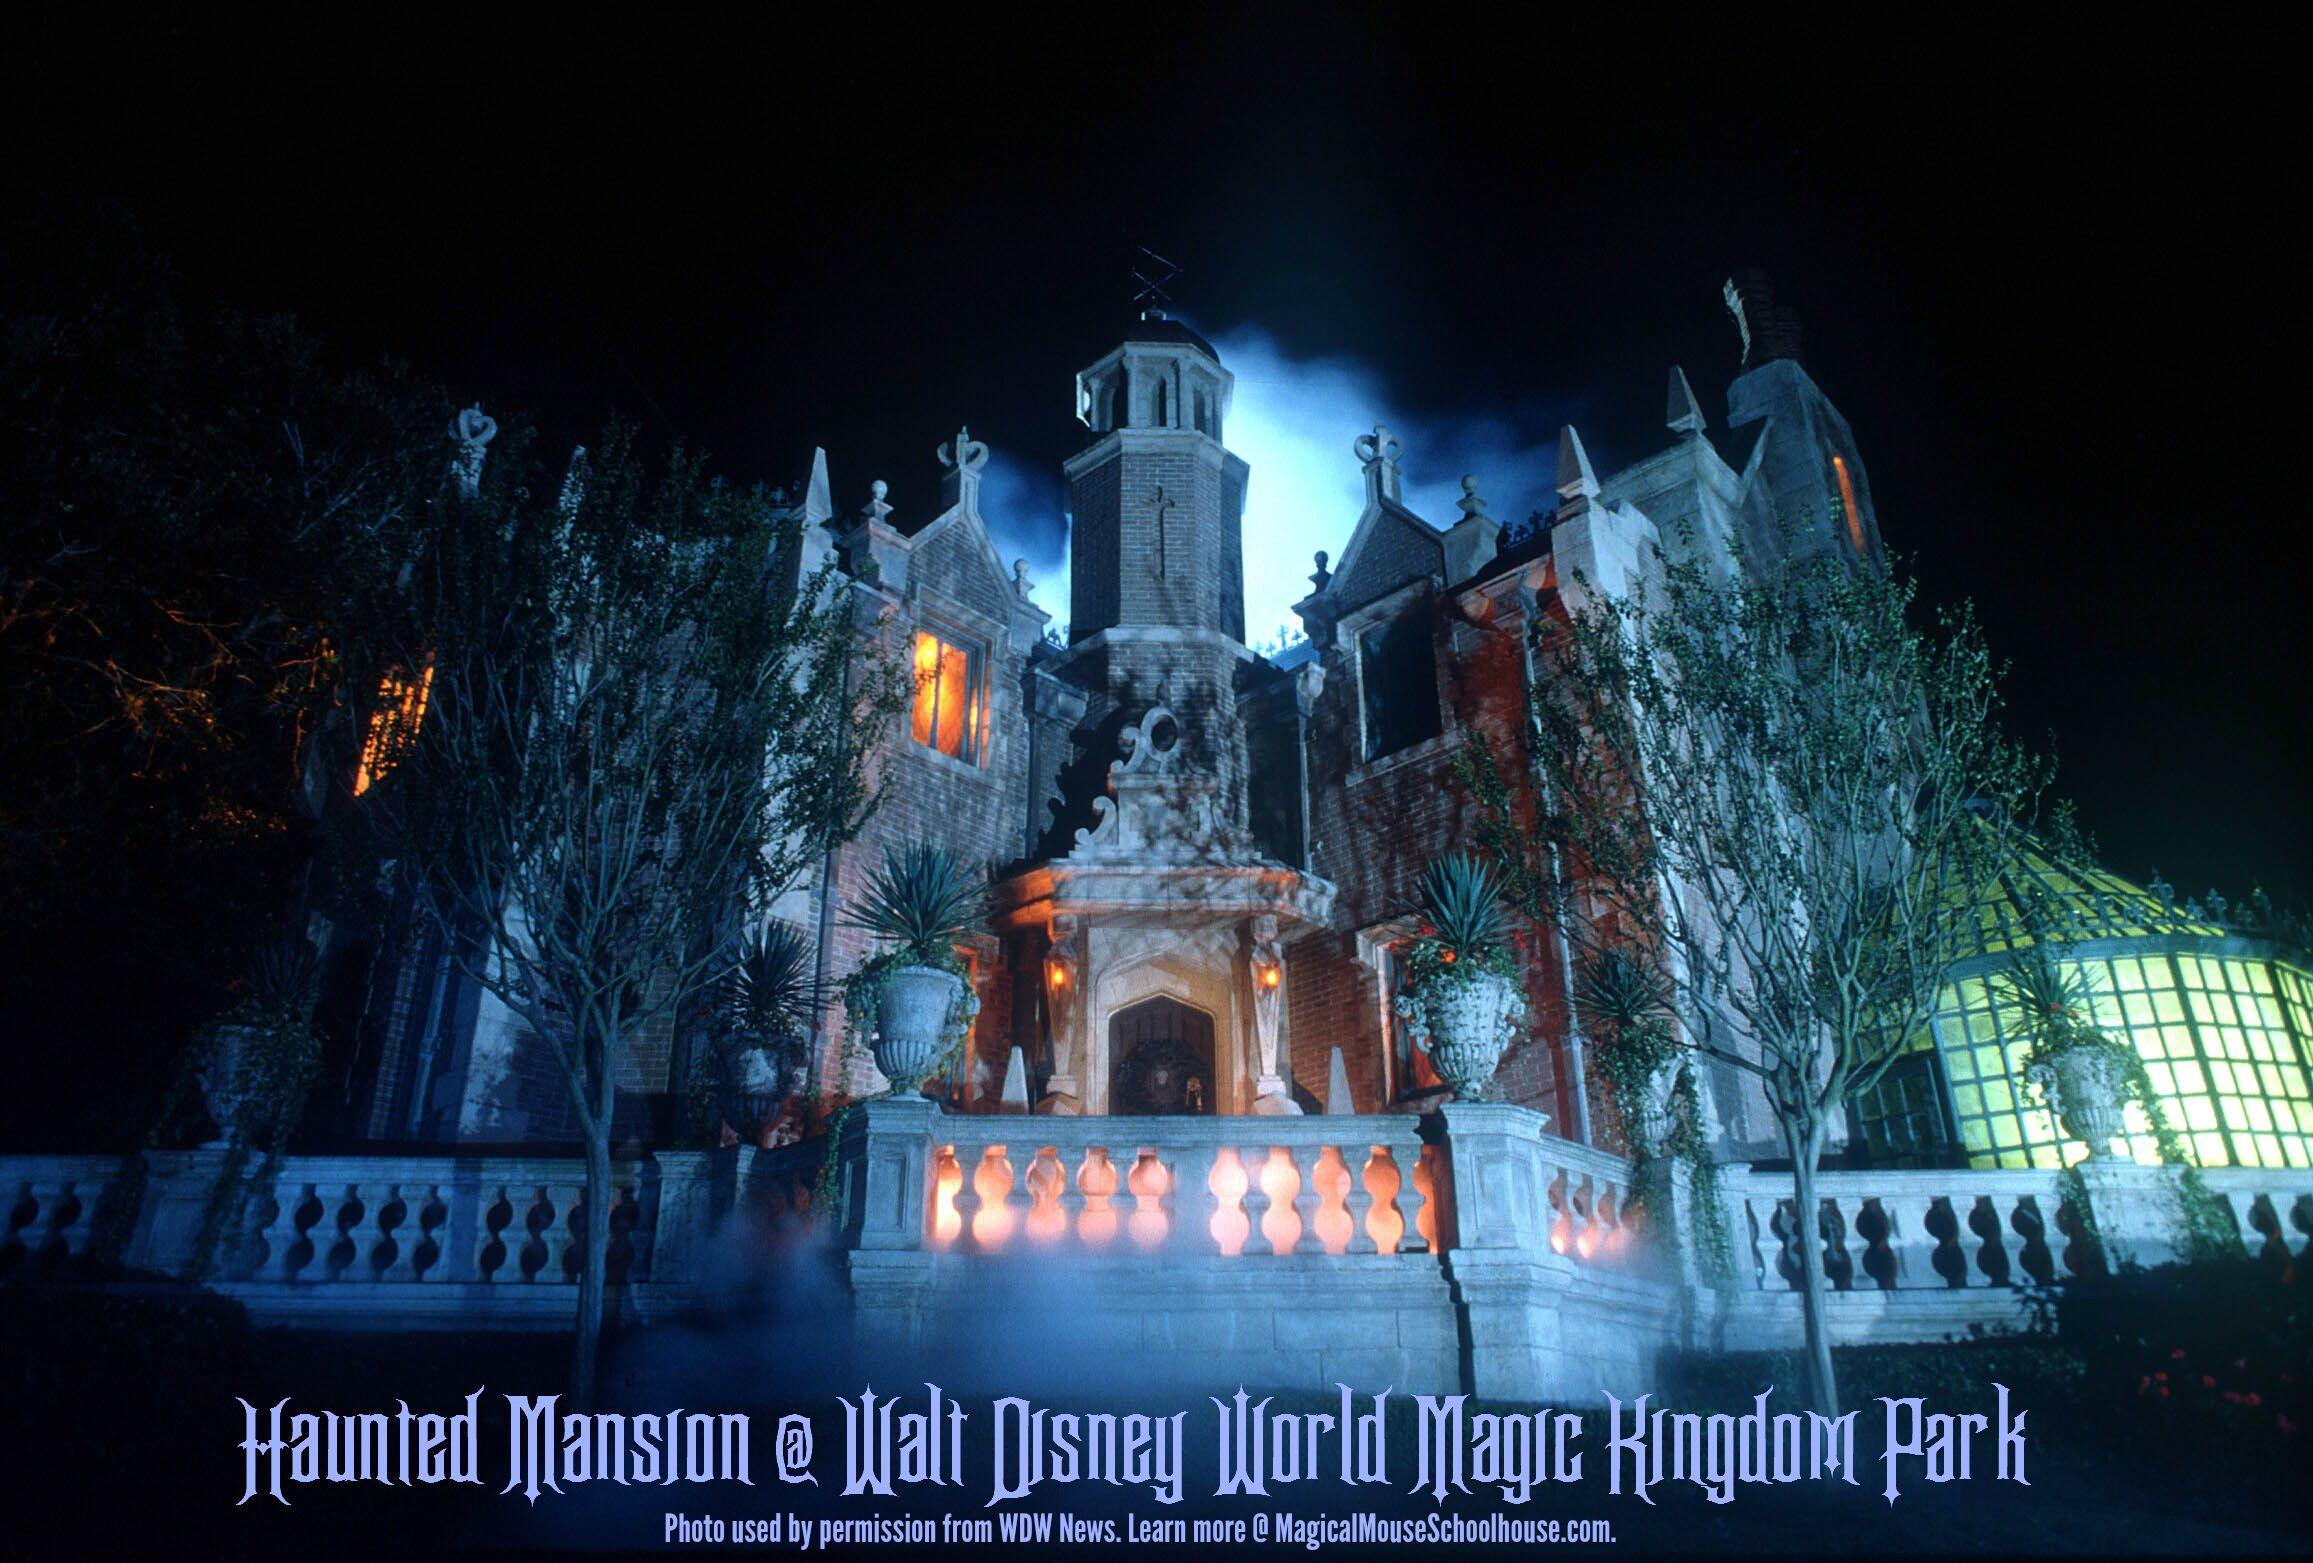 Magic Kingdom Park: #HauntedMansion